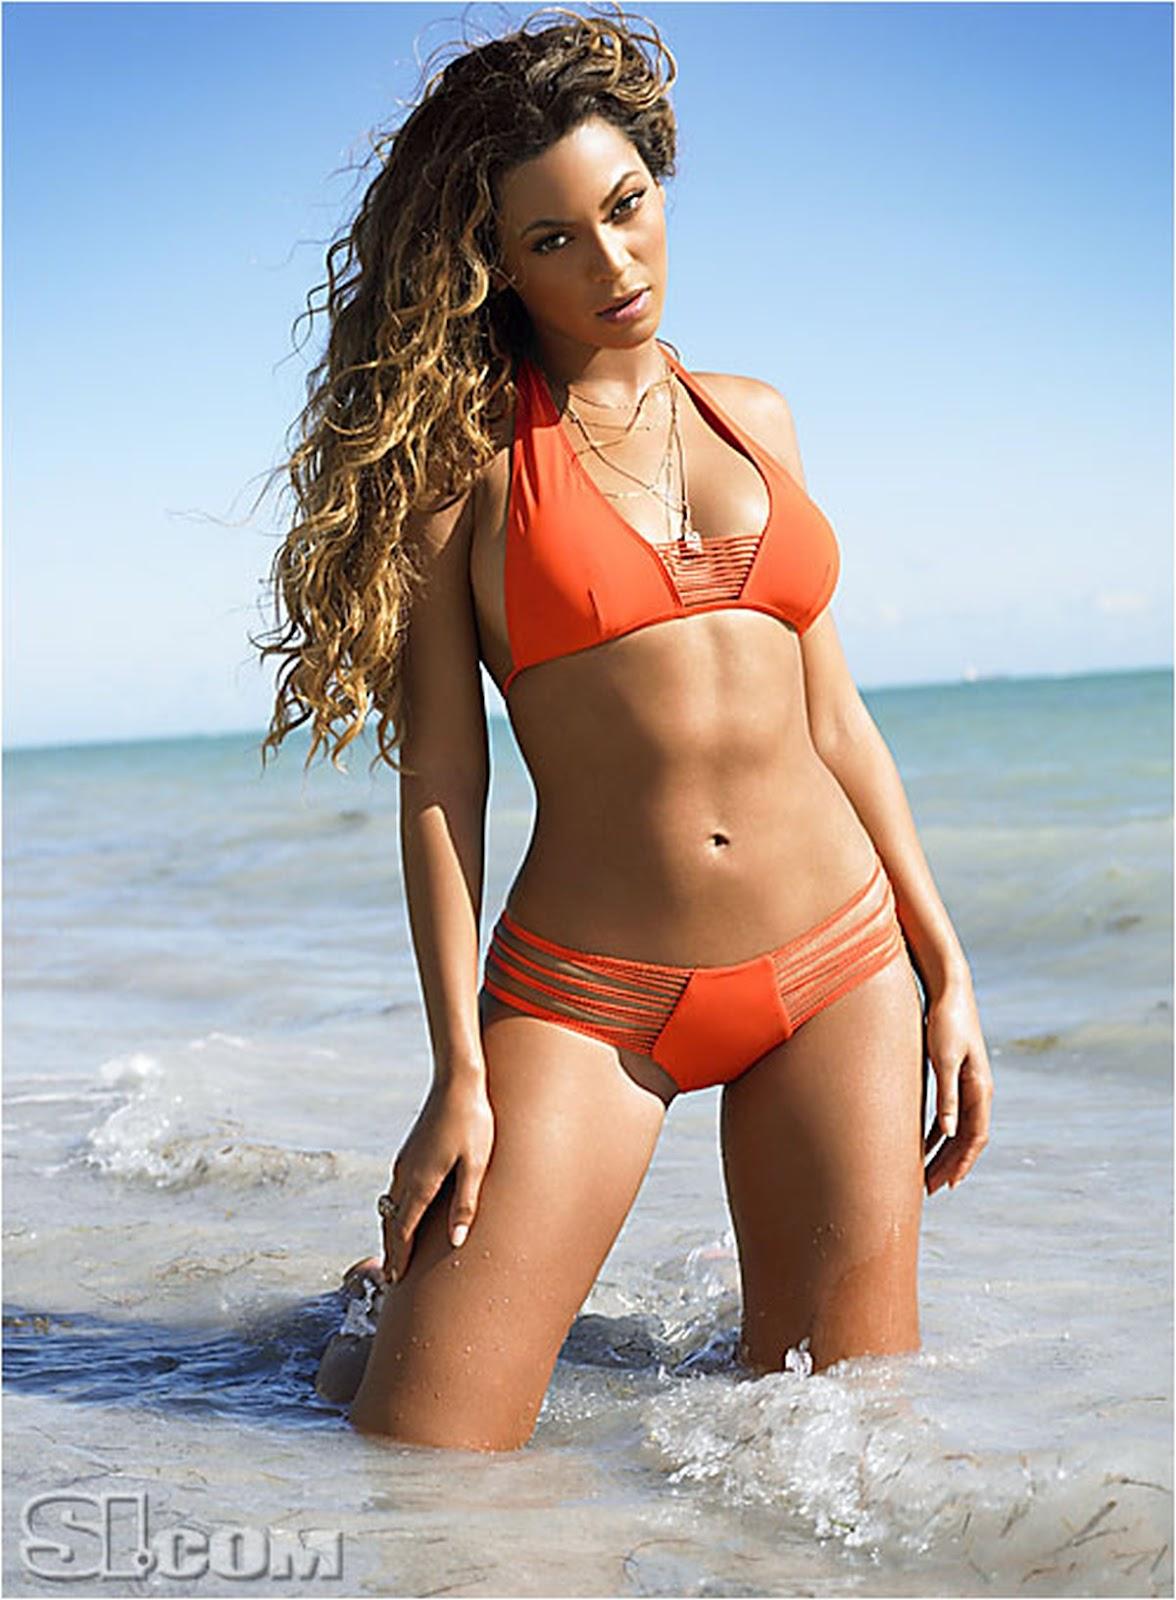 http://1.bp.blogspot.com/-V3Vj1SRf68Q/T6IcugCUE8I/AAAAAAAAAnA/BoKDgO3Qm4U/s1600/Sexy_Beyonce_Bikini_HQ_Wallpapers_Pack_1-1.jpg_Picture_-_23.jpg